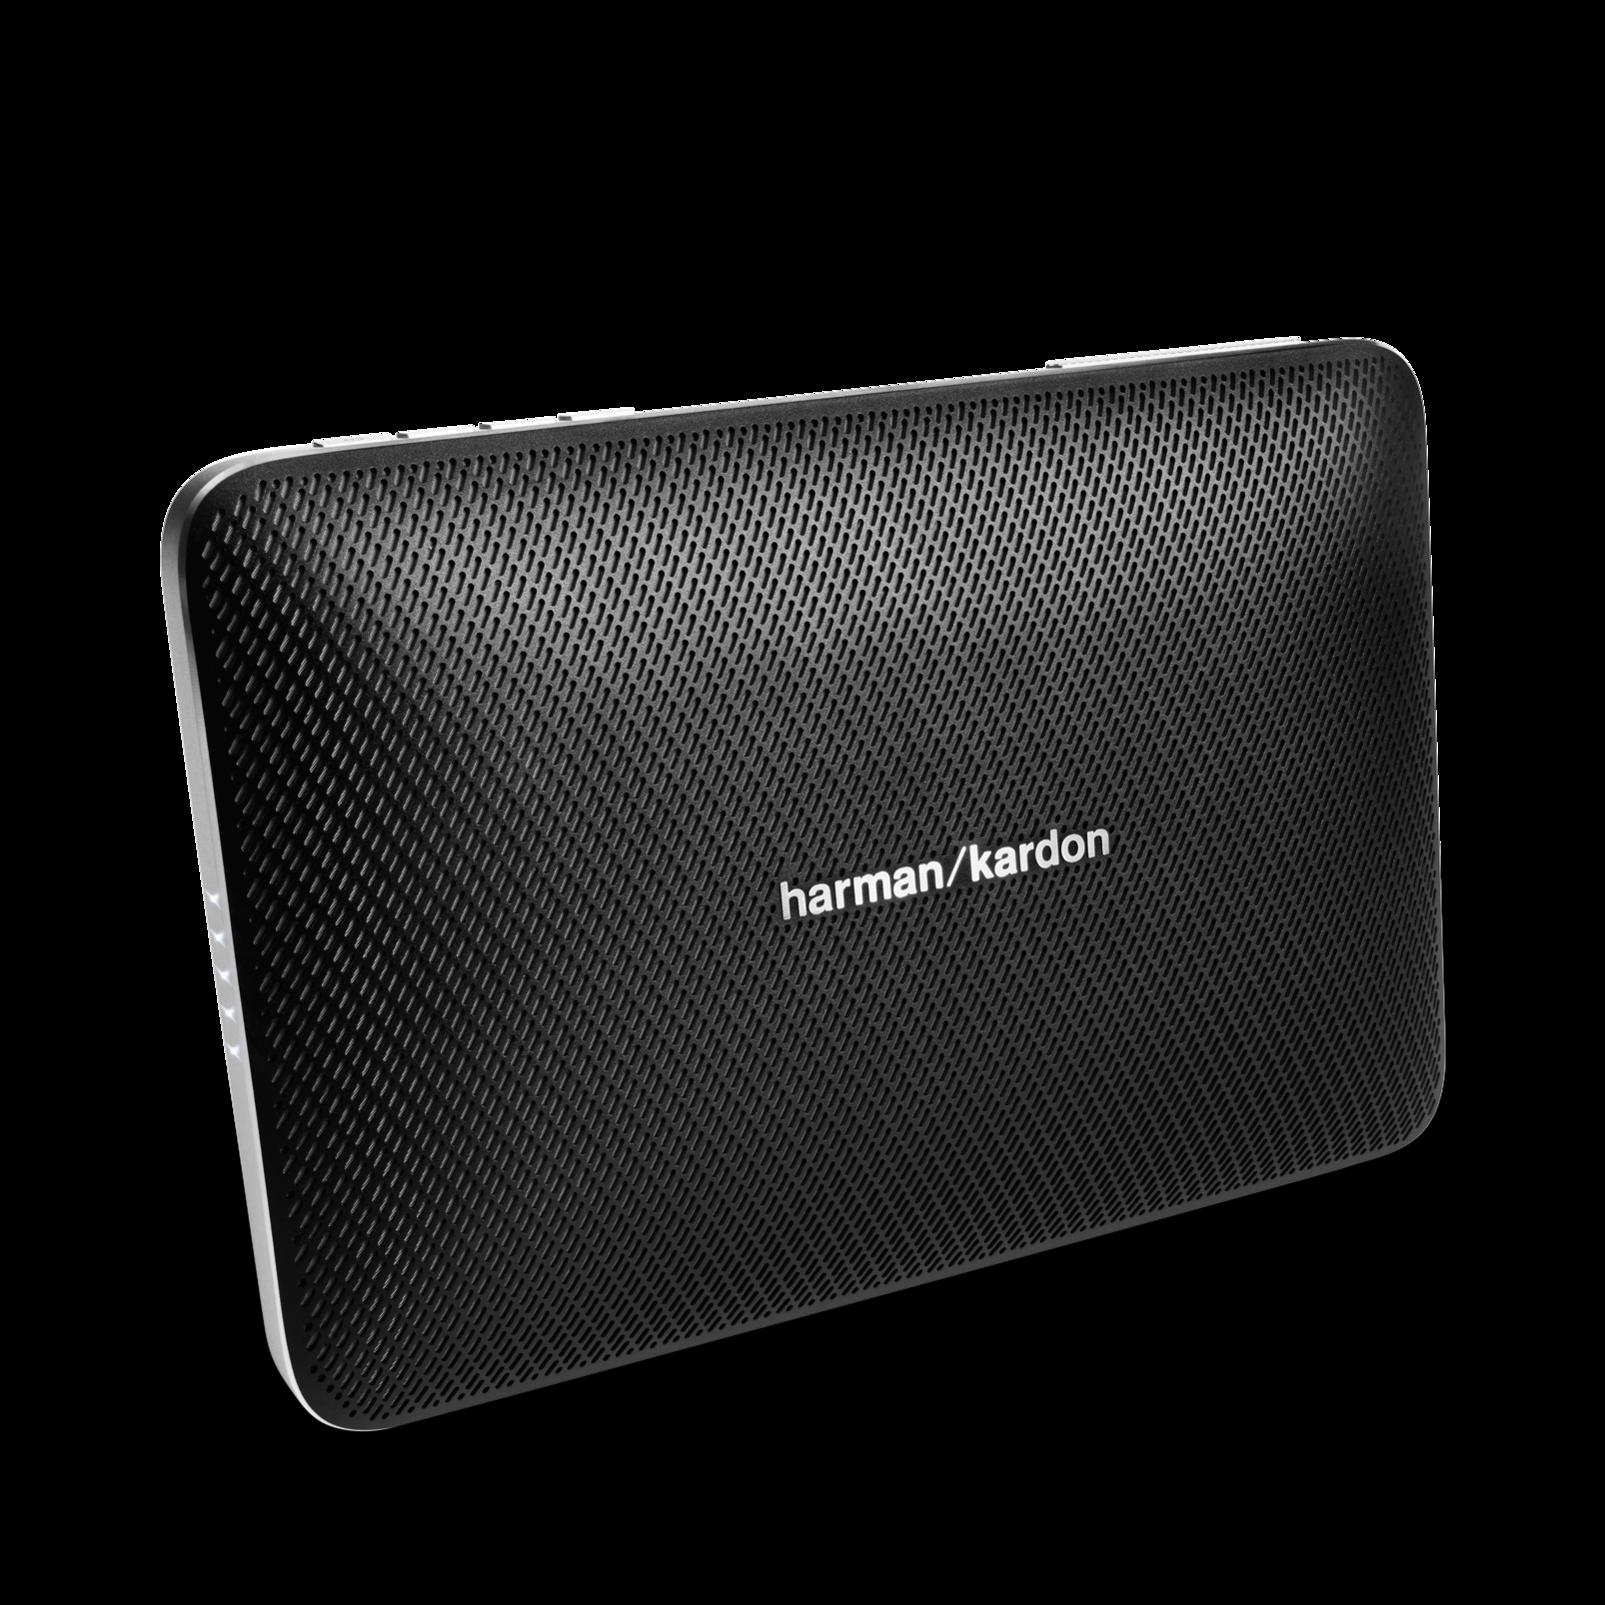 Esquire 2 - Black - Premium portable Bluetooth speaker with quad microphone conferencing system - Hero